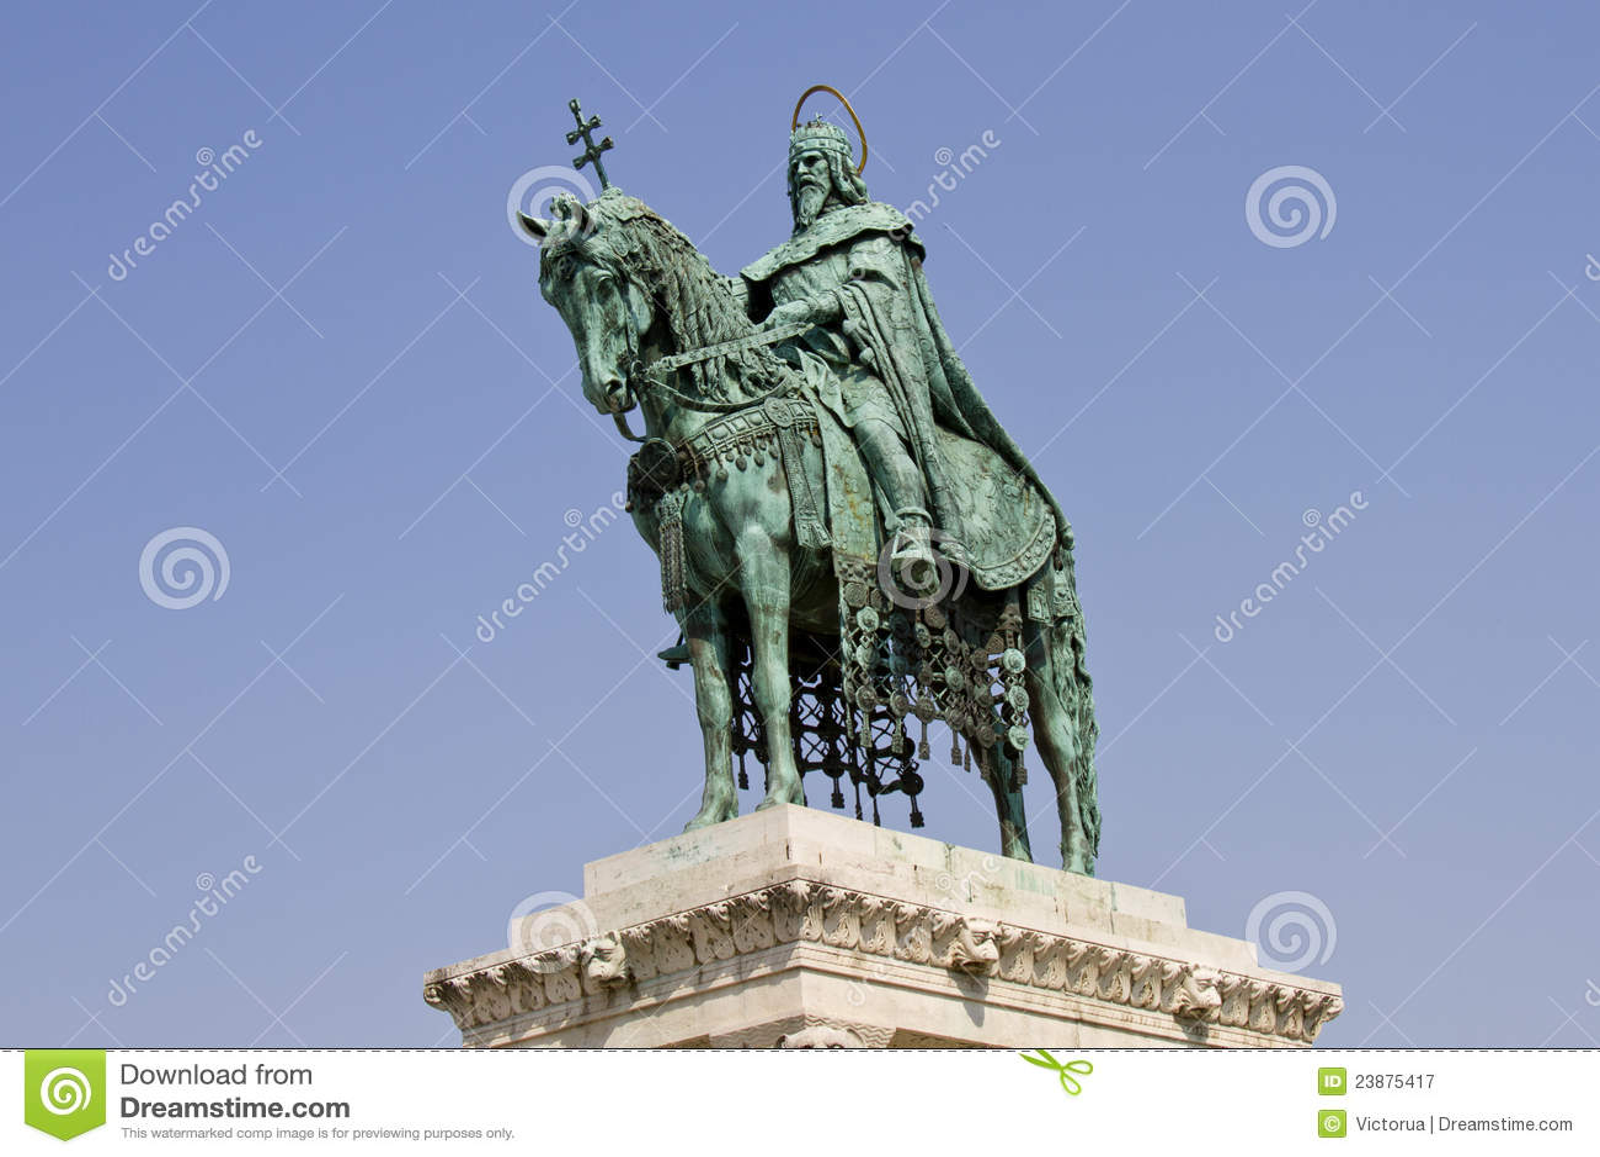 Statue of Saint Stephen I, Budapest, Hungary